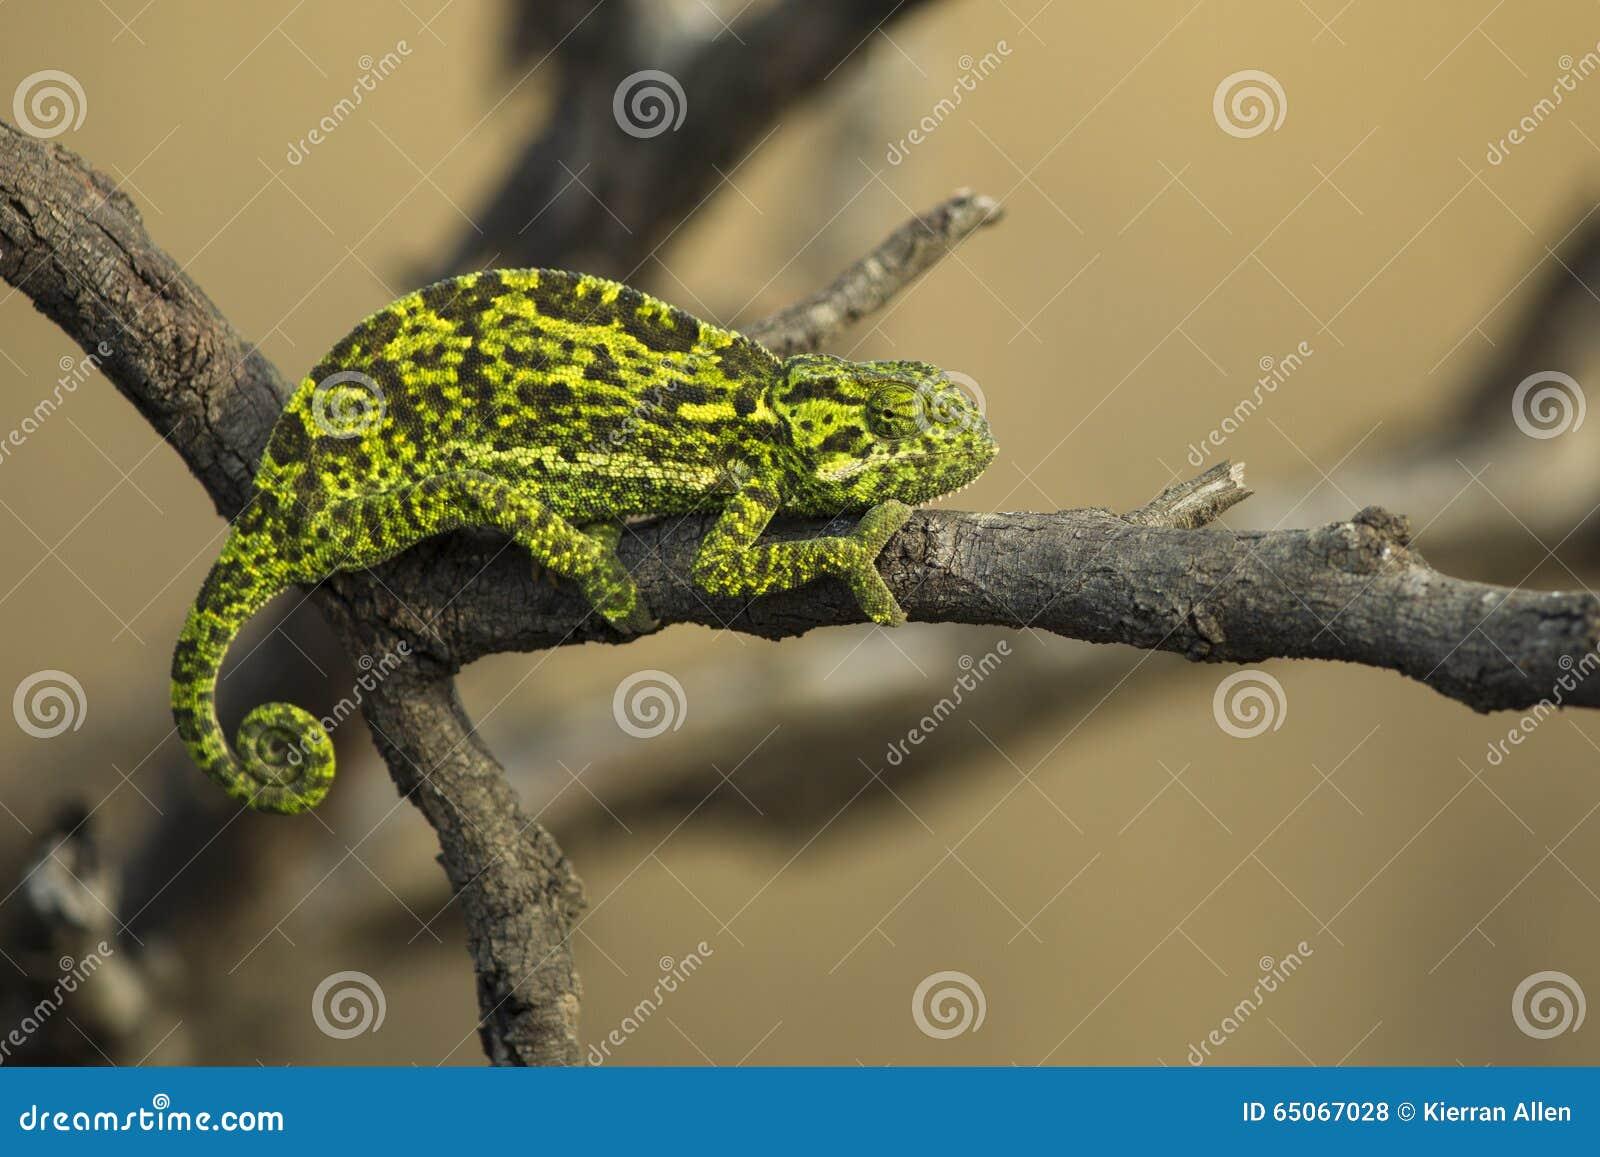 Chameleon climbing branch in tree